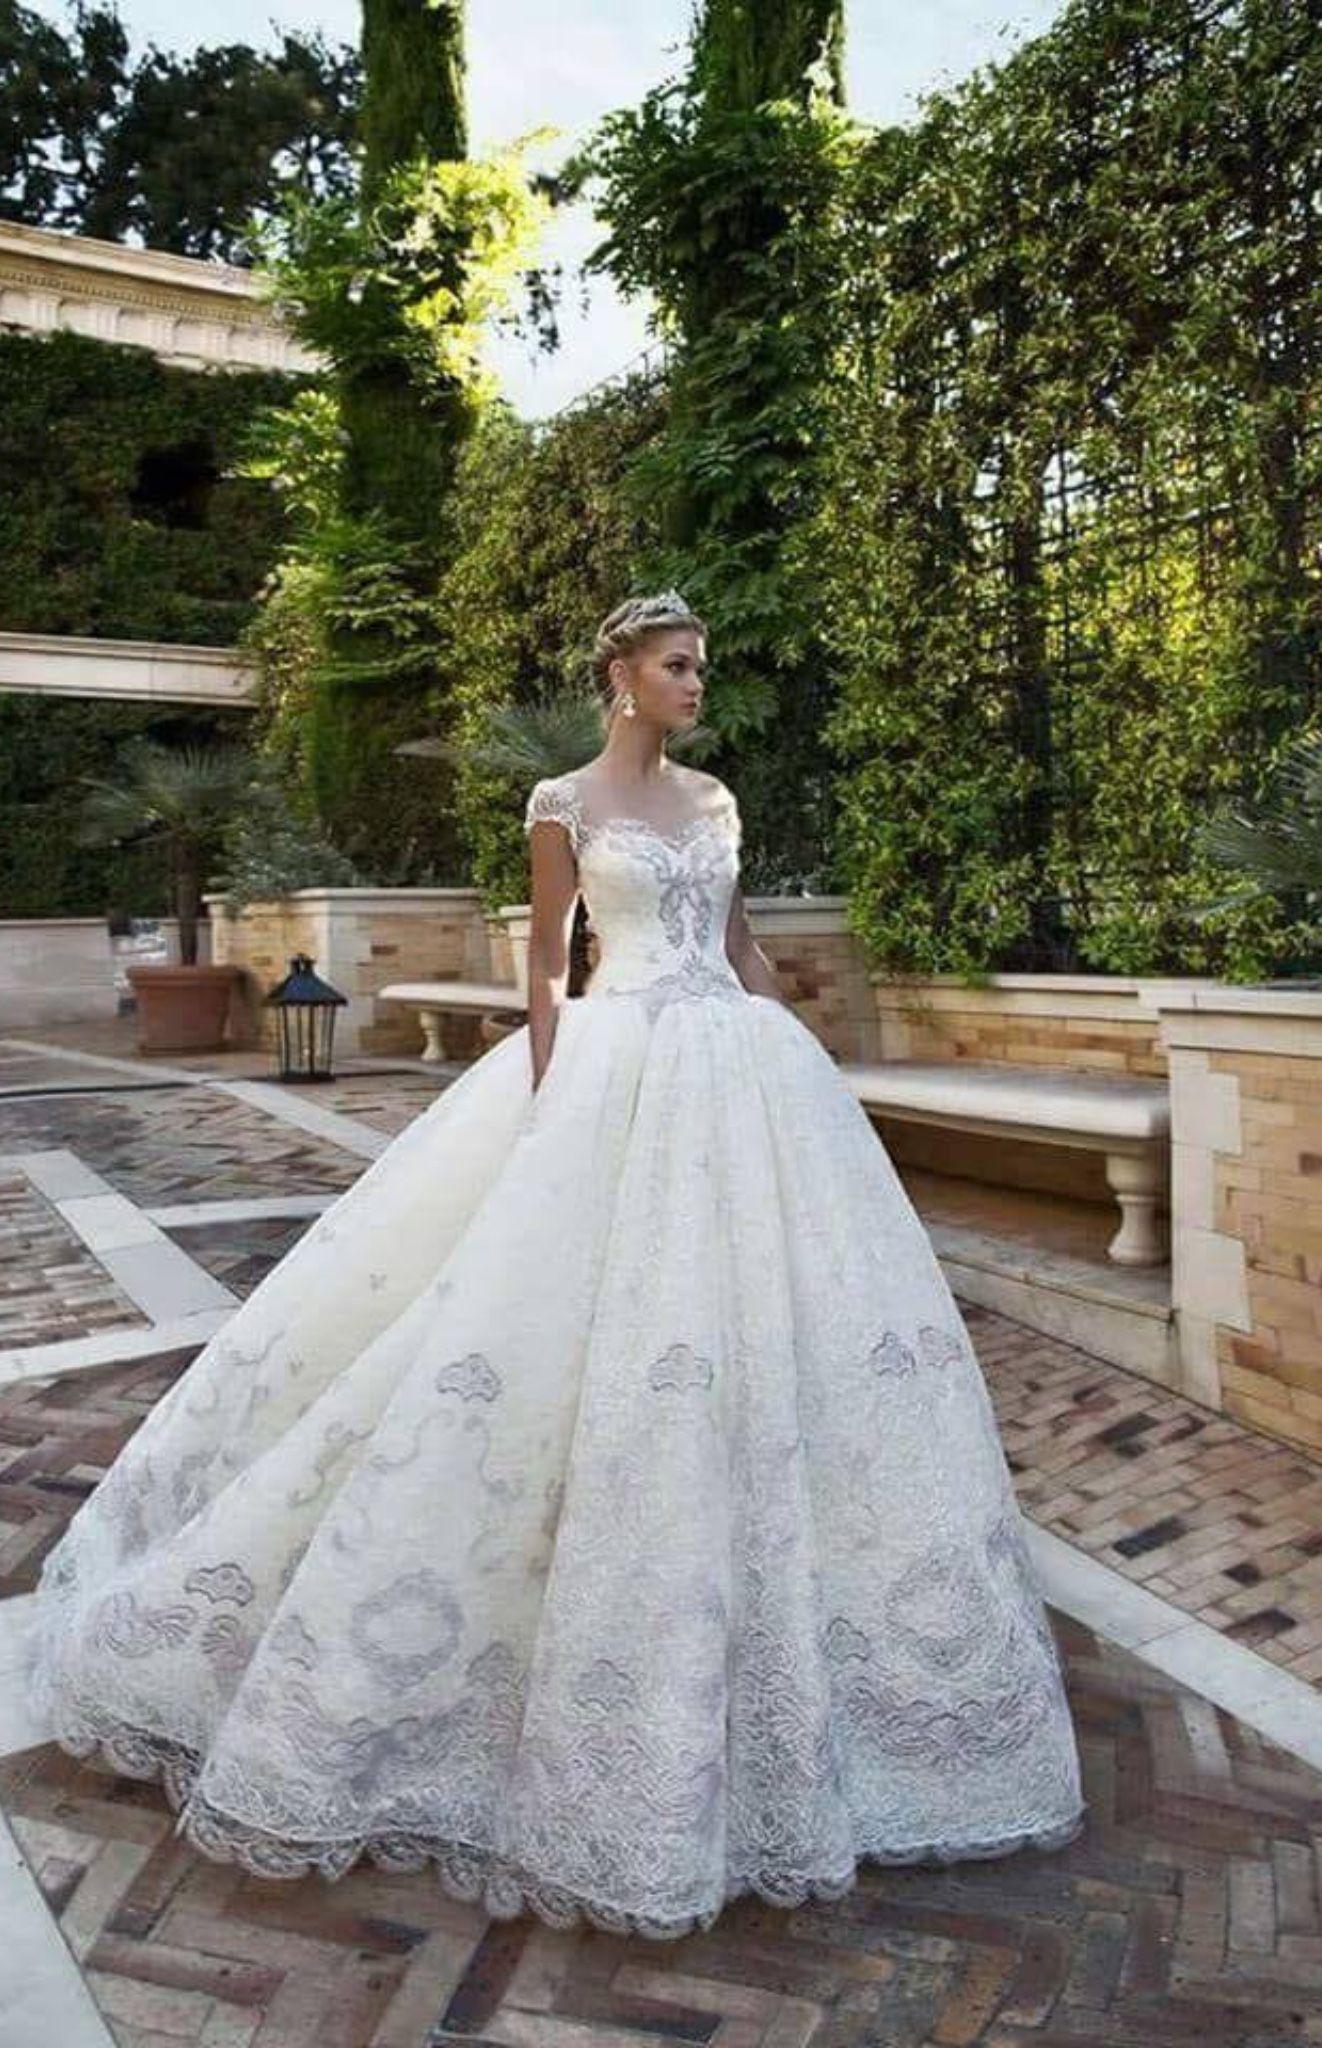 Pin by joey barragan on a wedding dress in pinterest